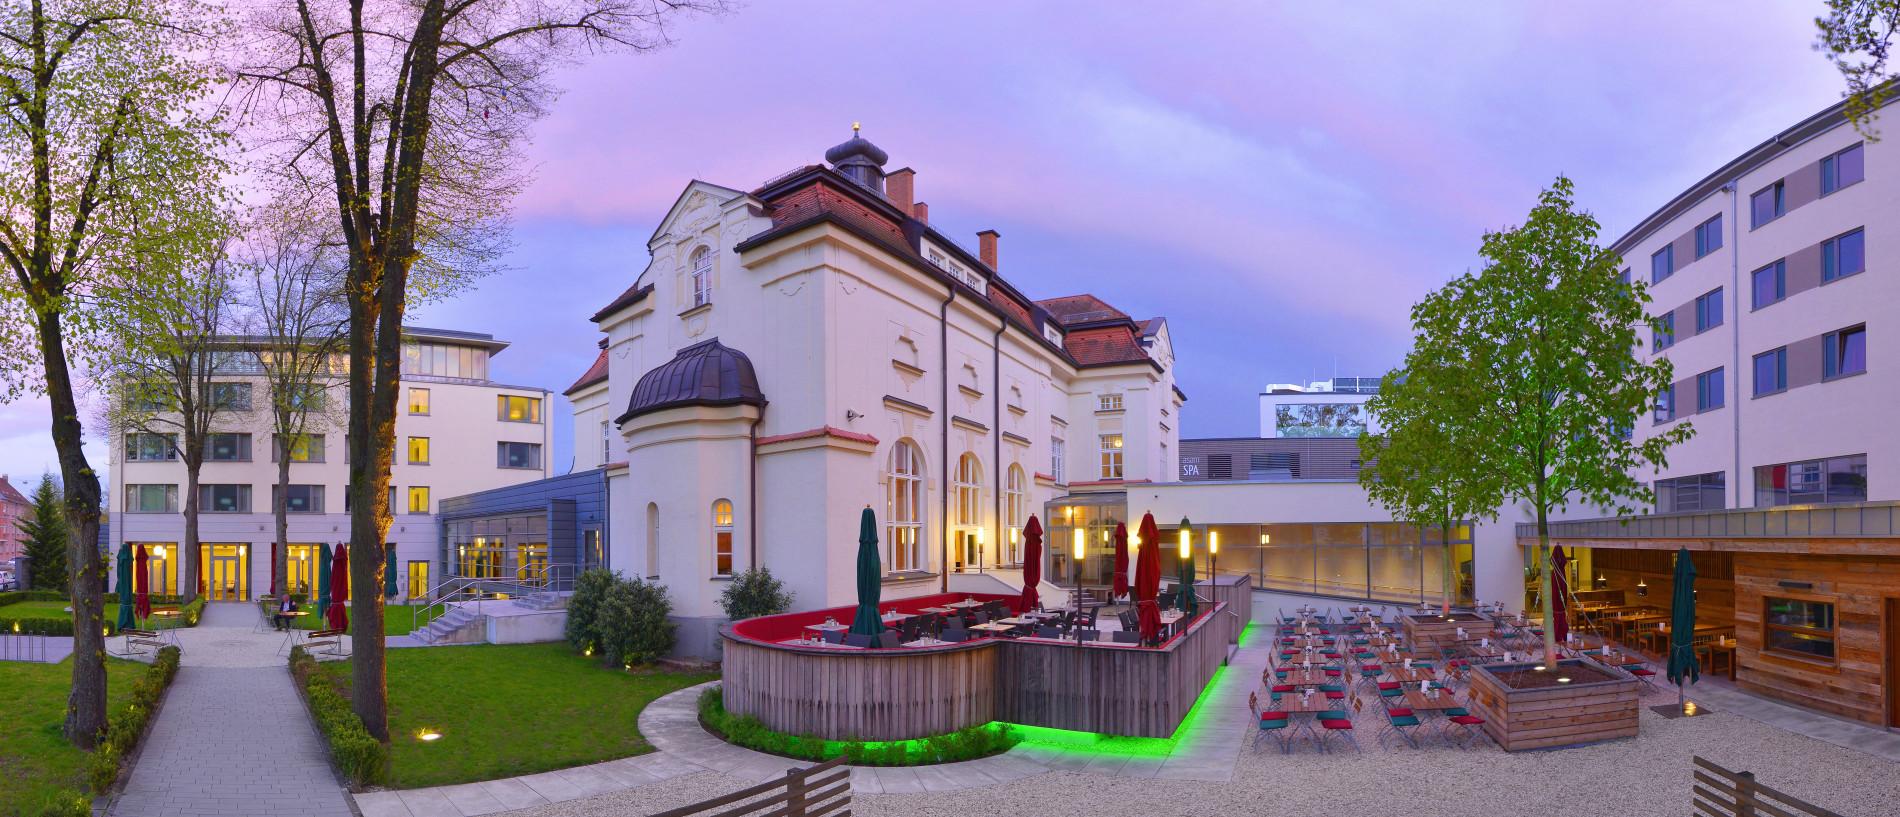 Straubing Hotel Asam